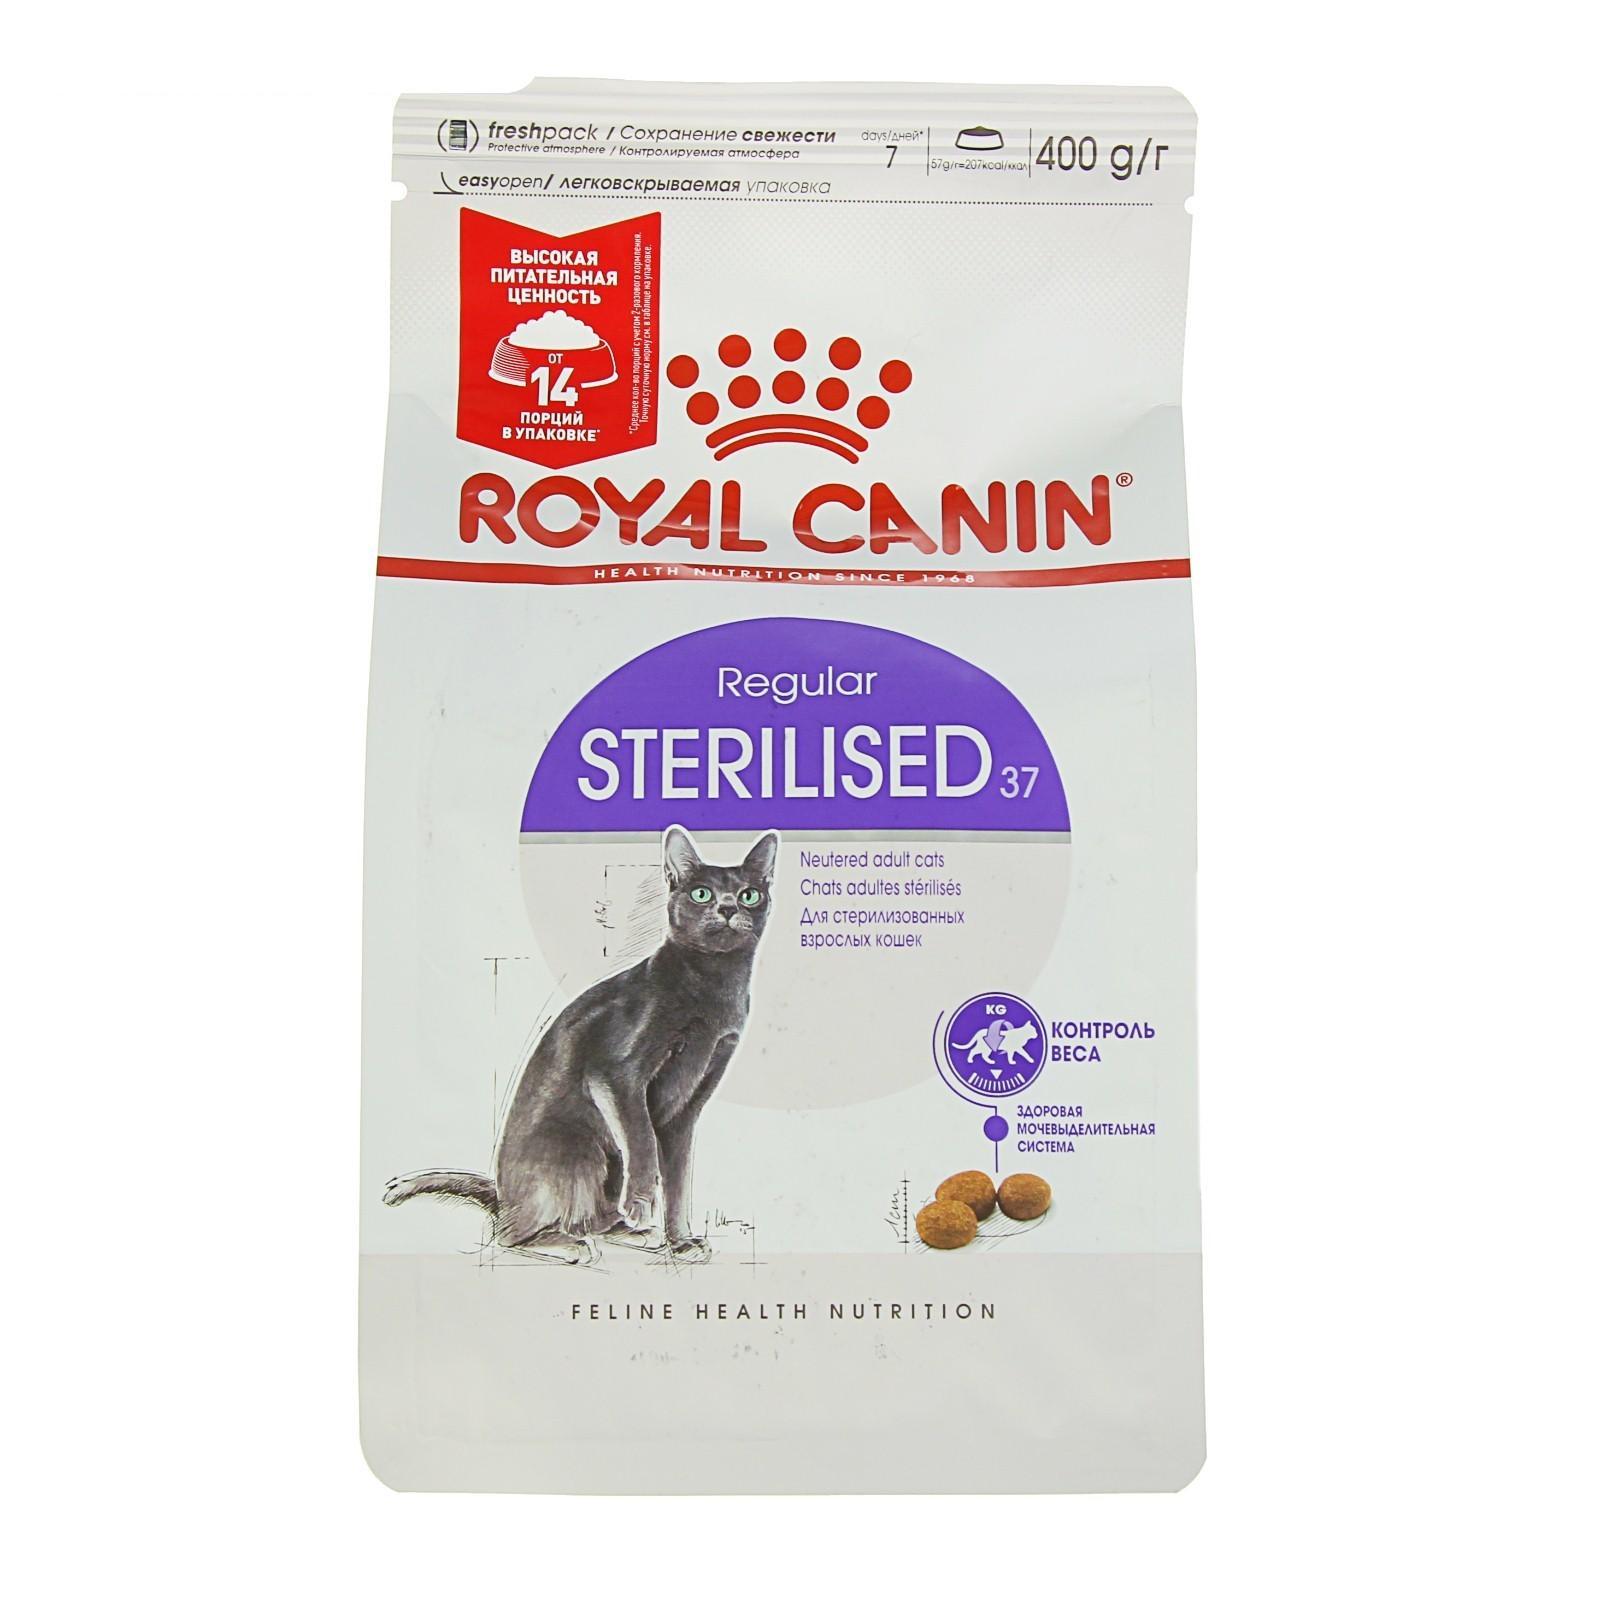 Royal Canin 37, профилактика избыточного веса